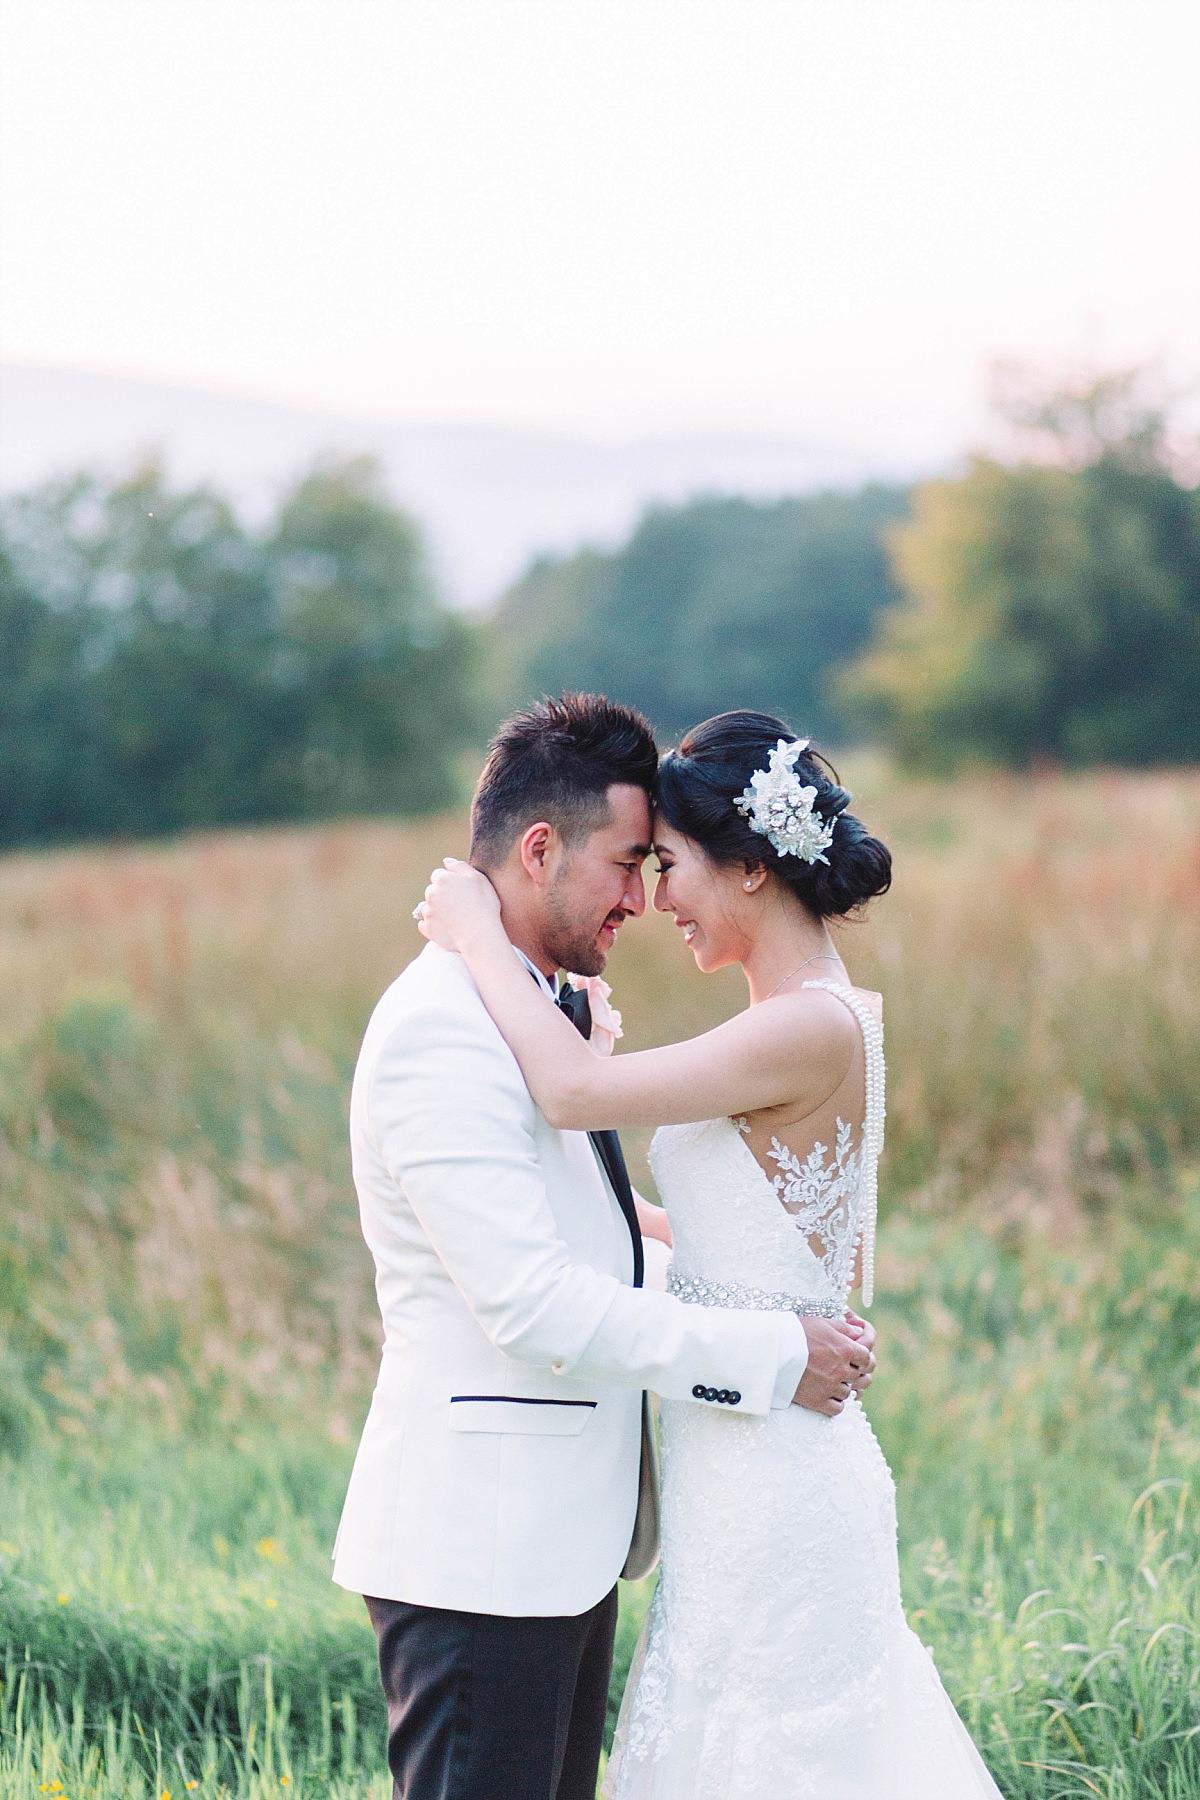 Solsgirth House Wedding Scotland 11-16.jpg